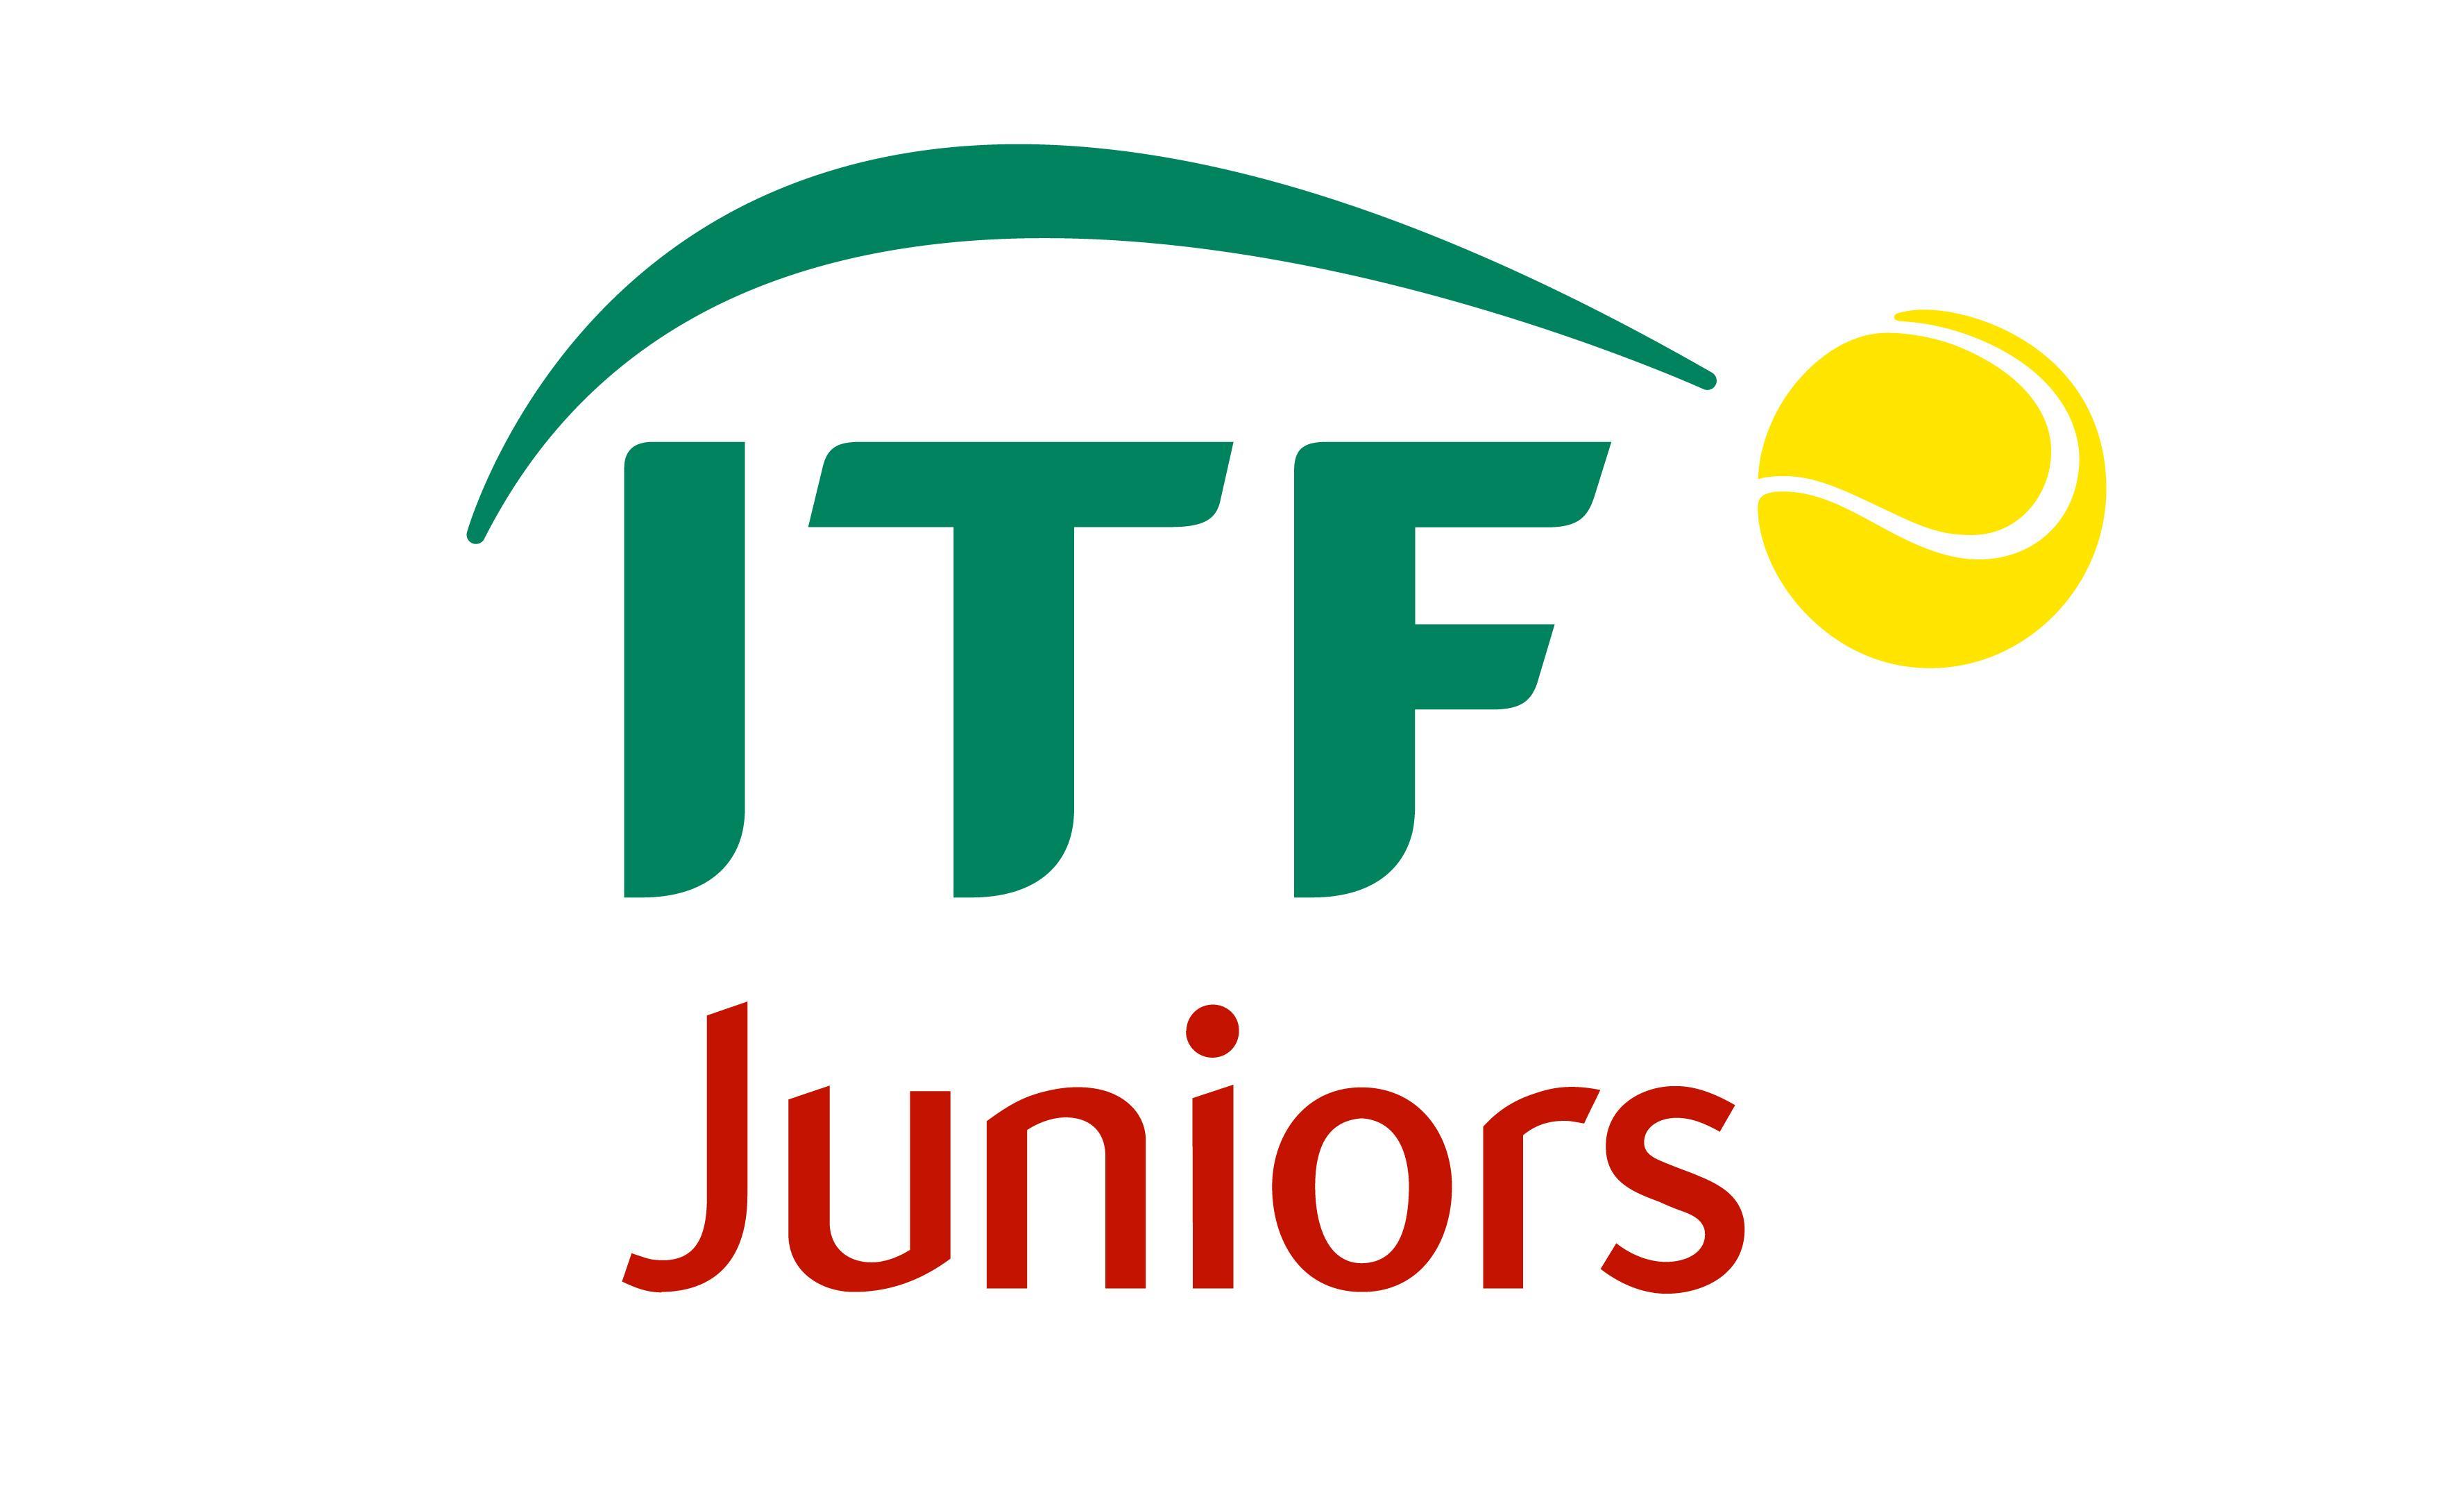 Tennis: Bassjak of Poland ITF Junior's quarter-finals